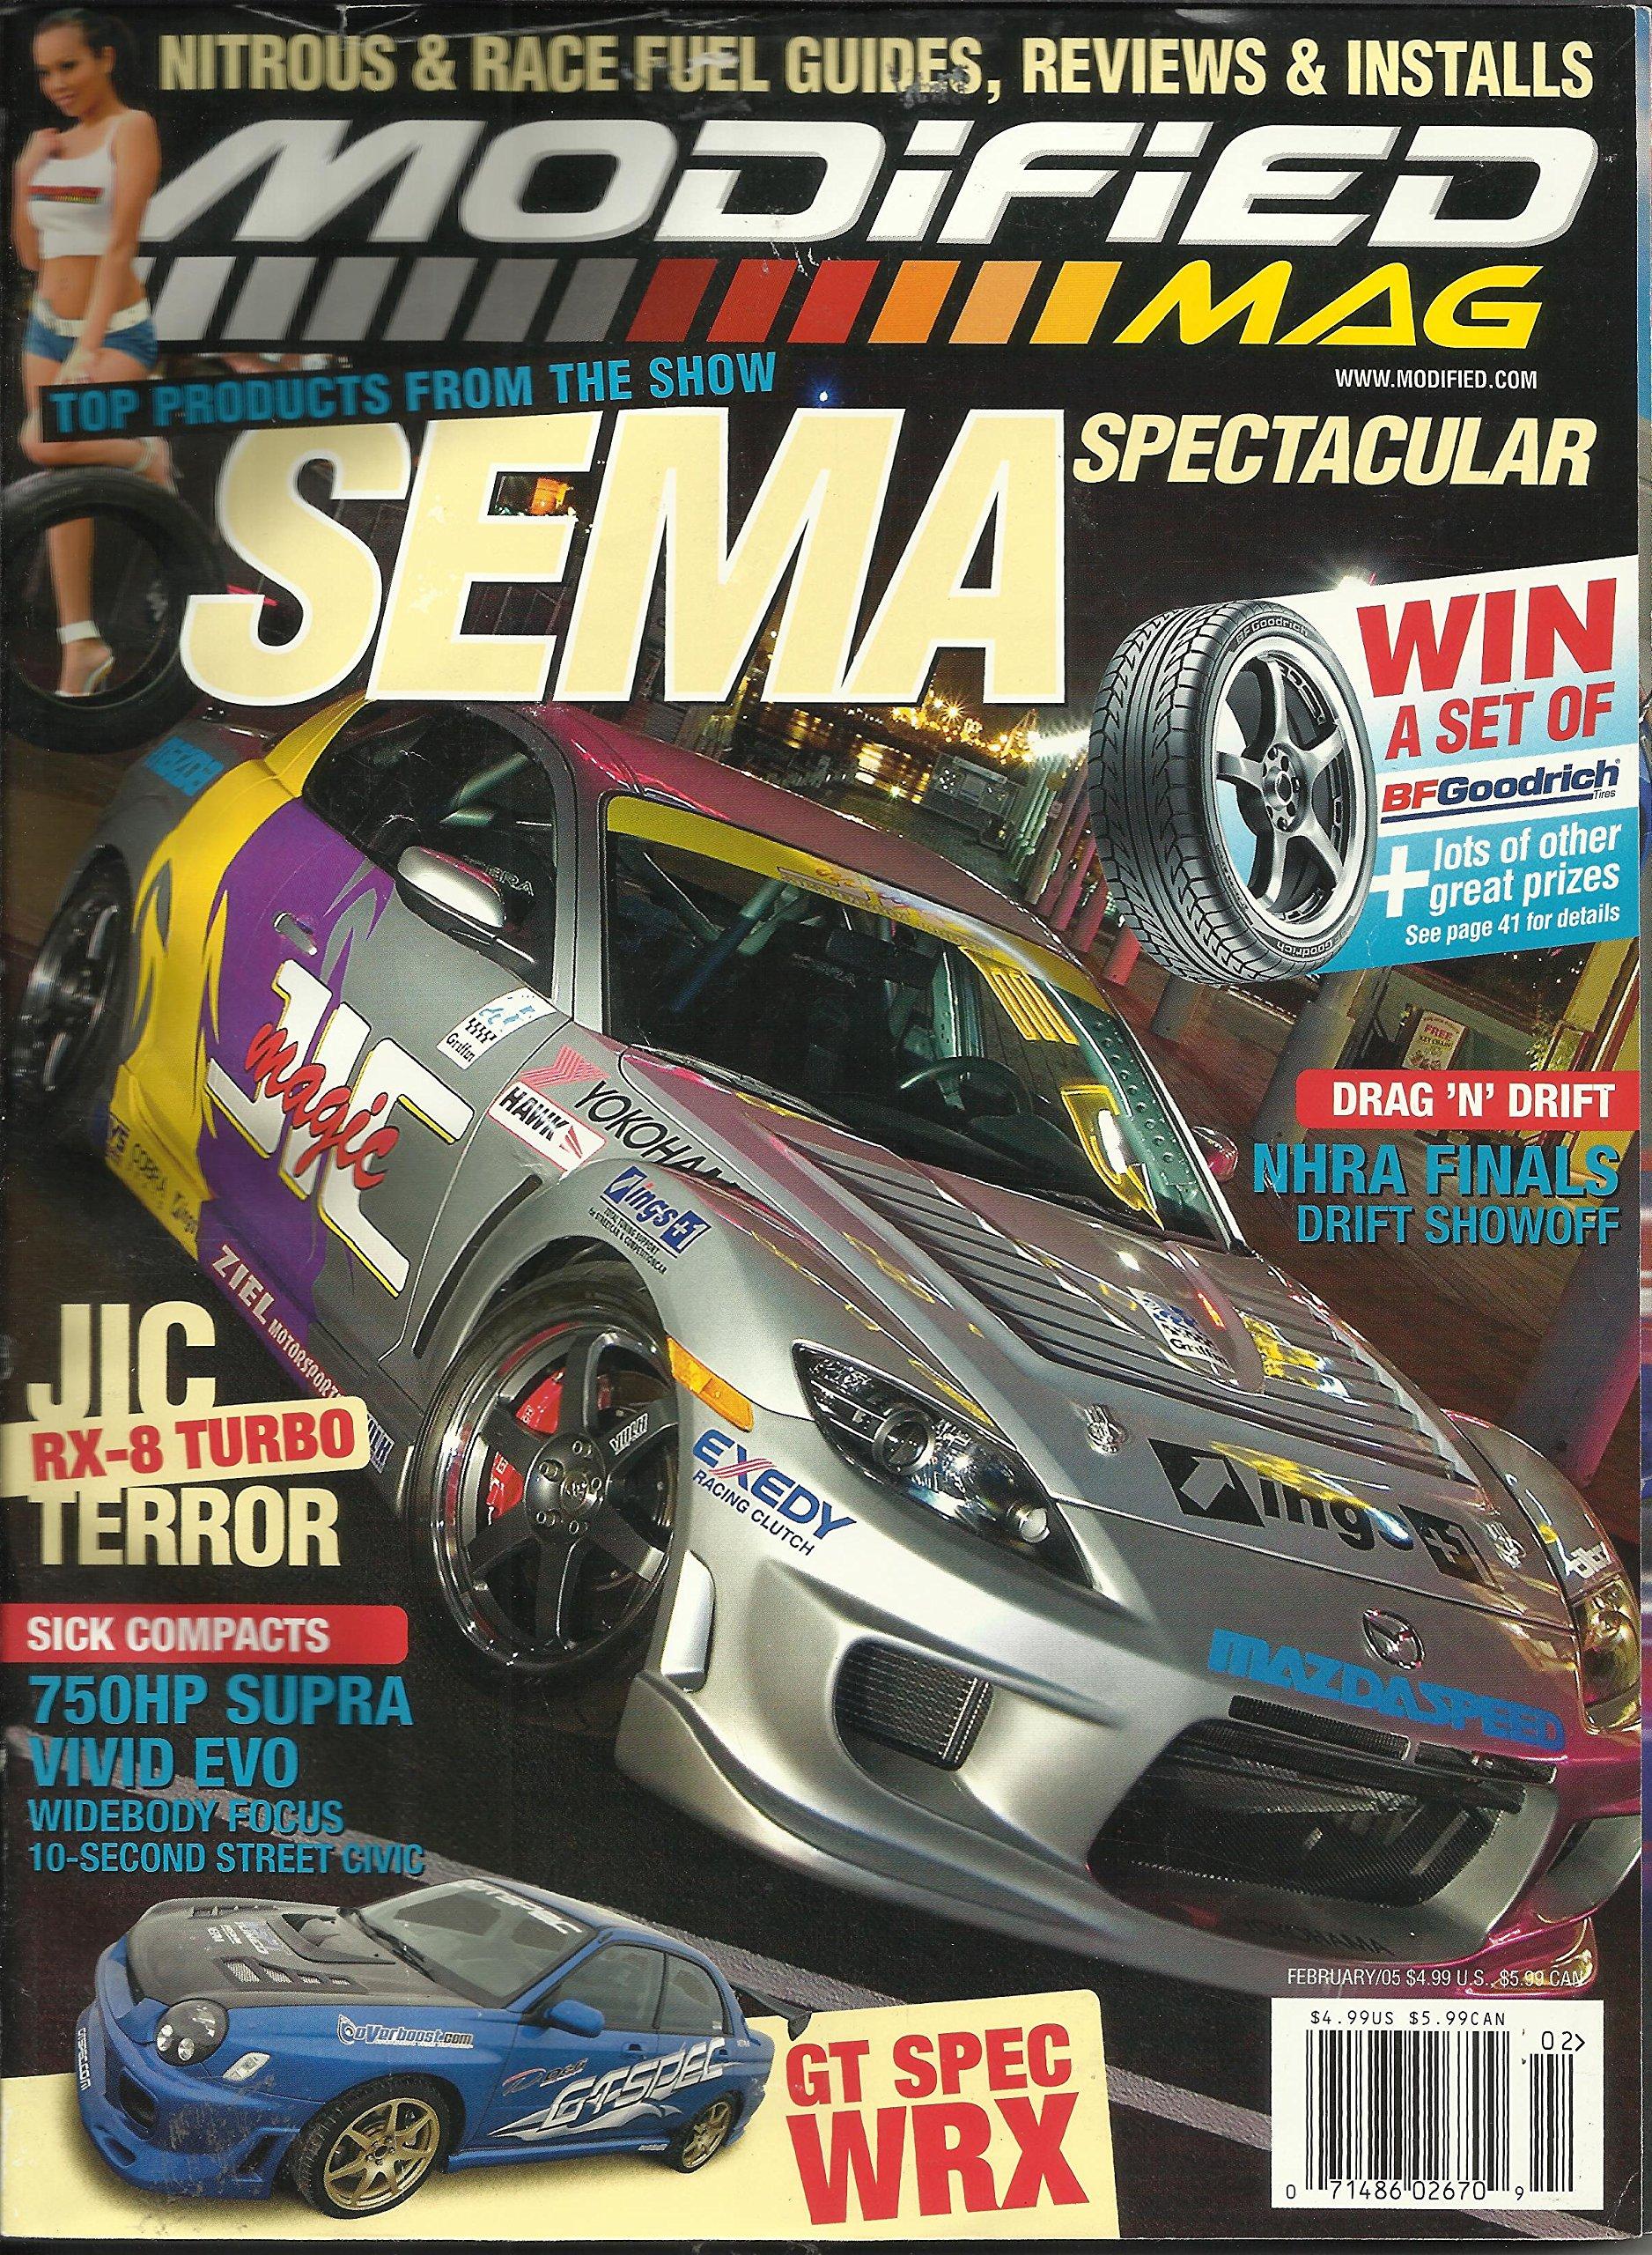 Modified Mag Magazine Februay 2005 NHRA Finals Drift Showoff, JIC Terror RX-8 Turbo, 750HP Supra Vivid Evo and More Single Issue Magazine – 2005